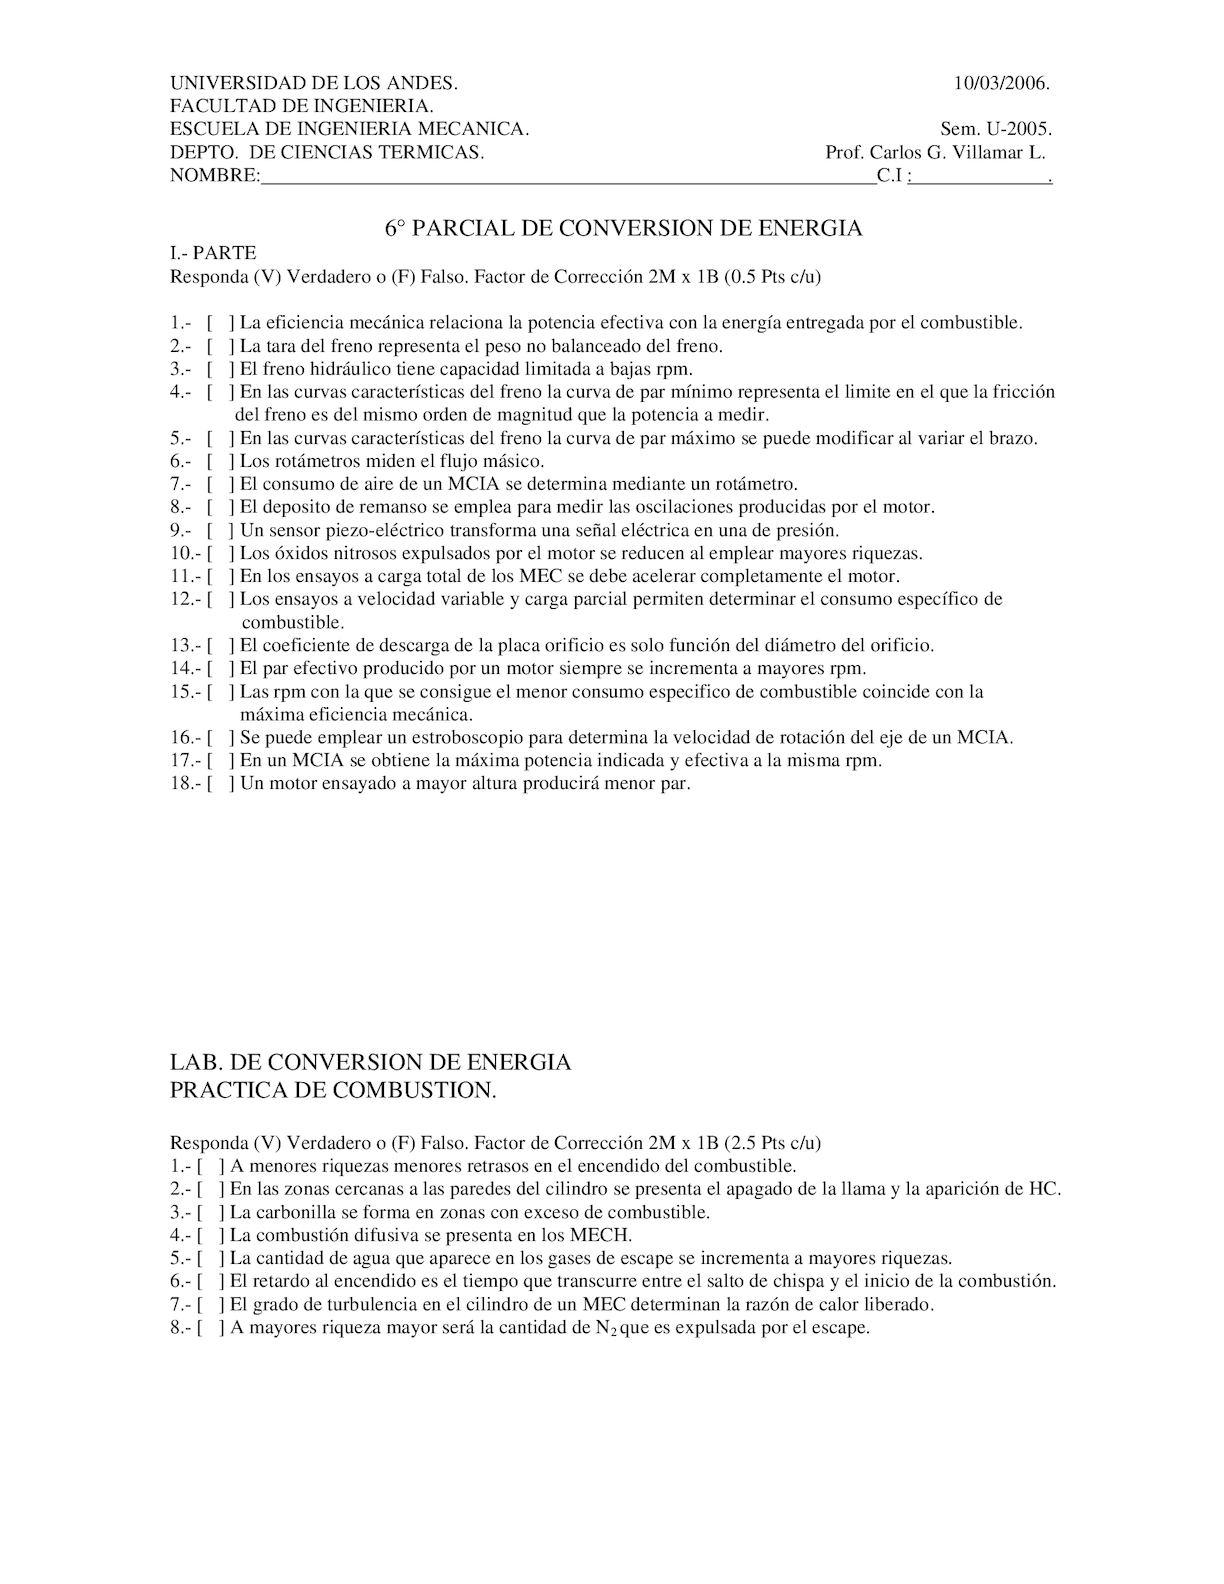 Parcial 6 Mcia U2005